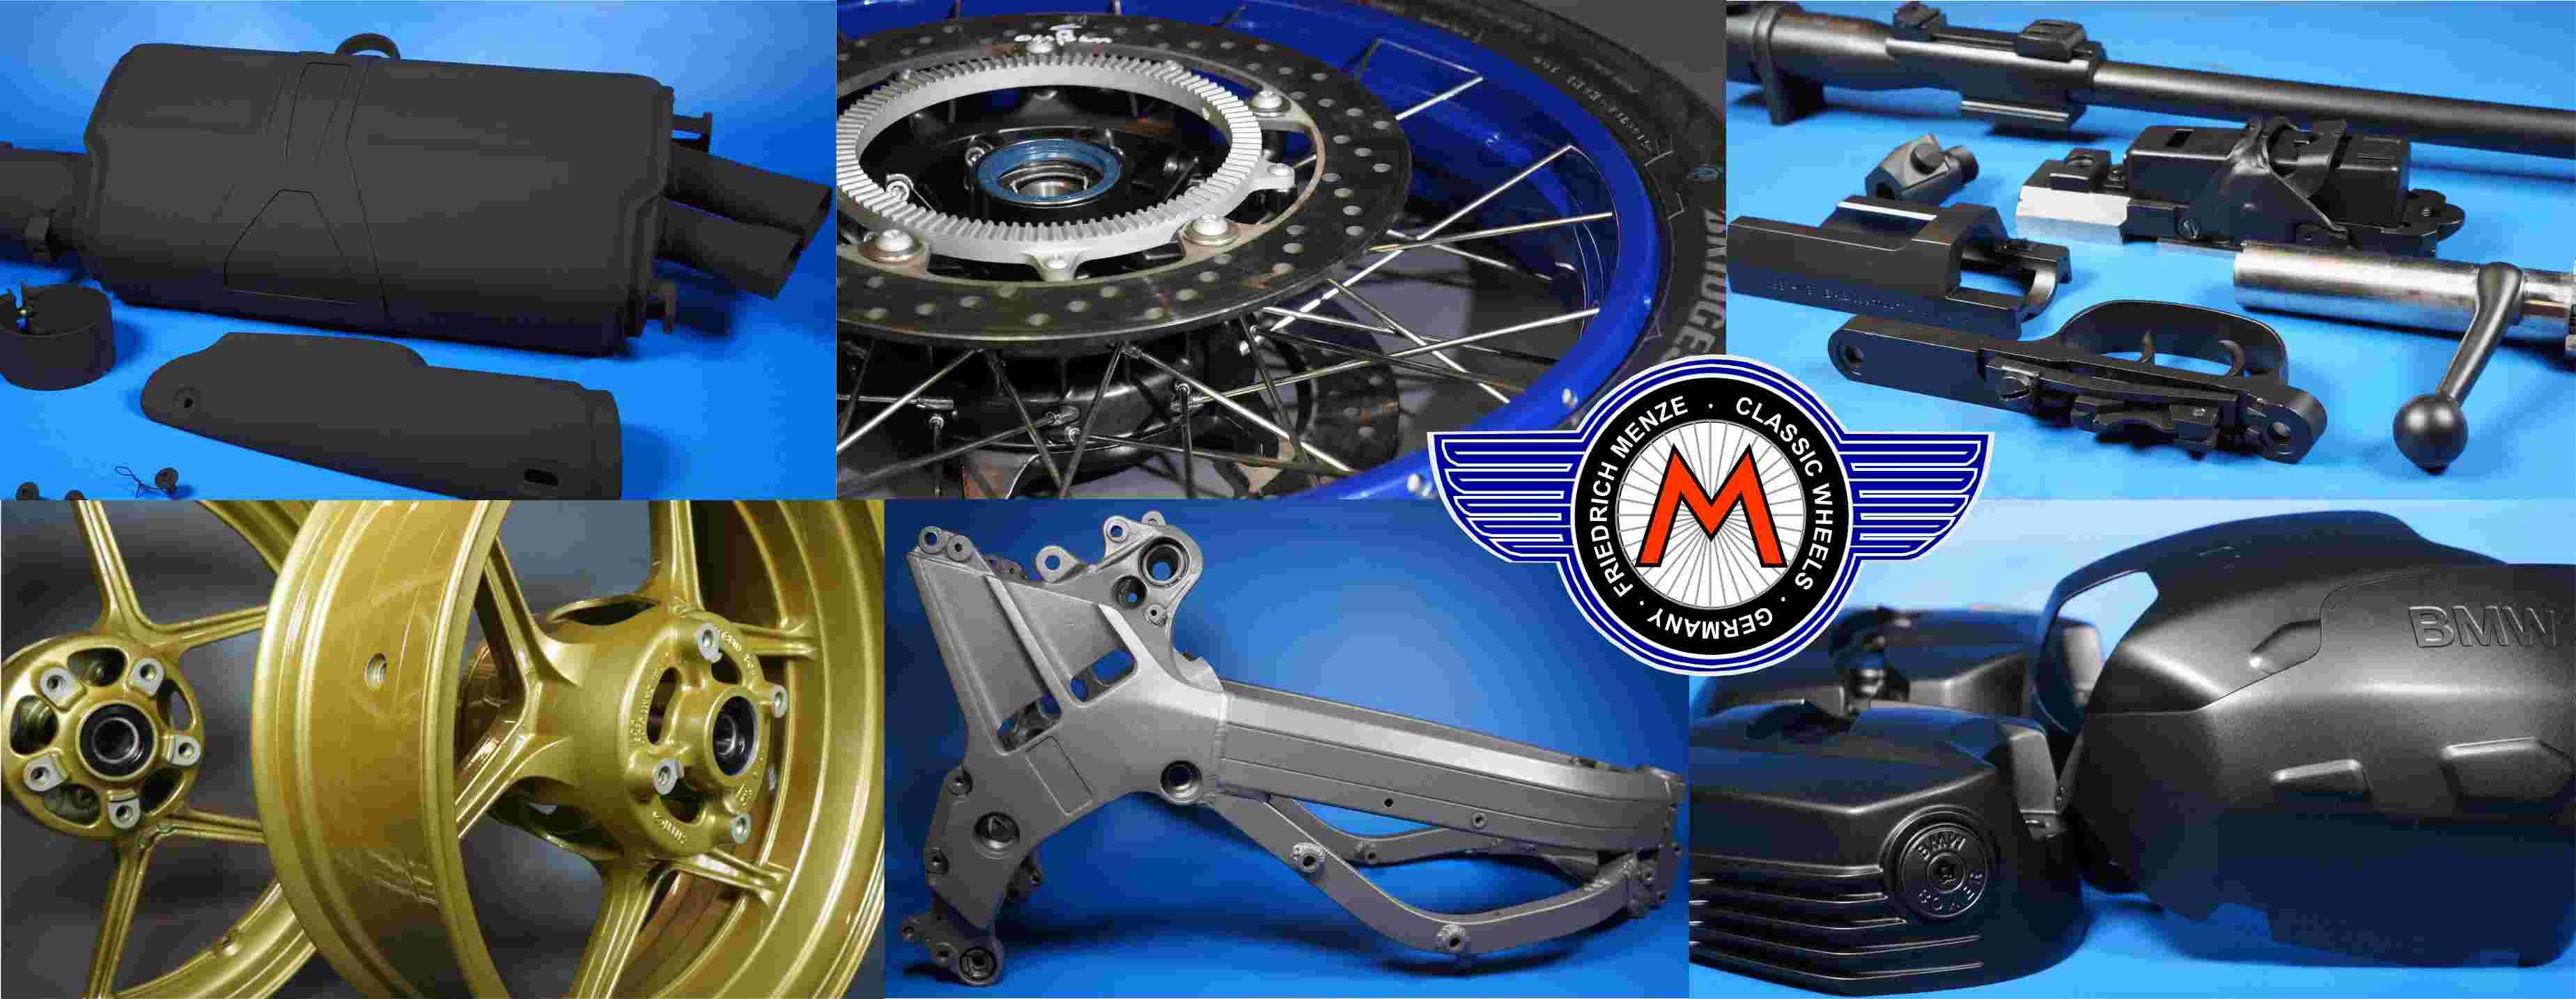 Motorcycle wheelbuilding and restorations